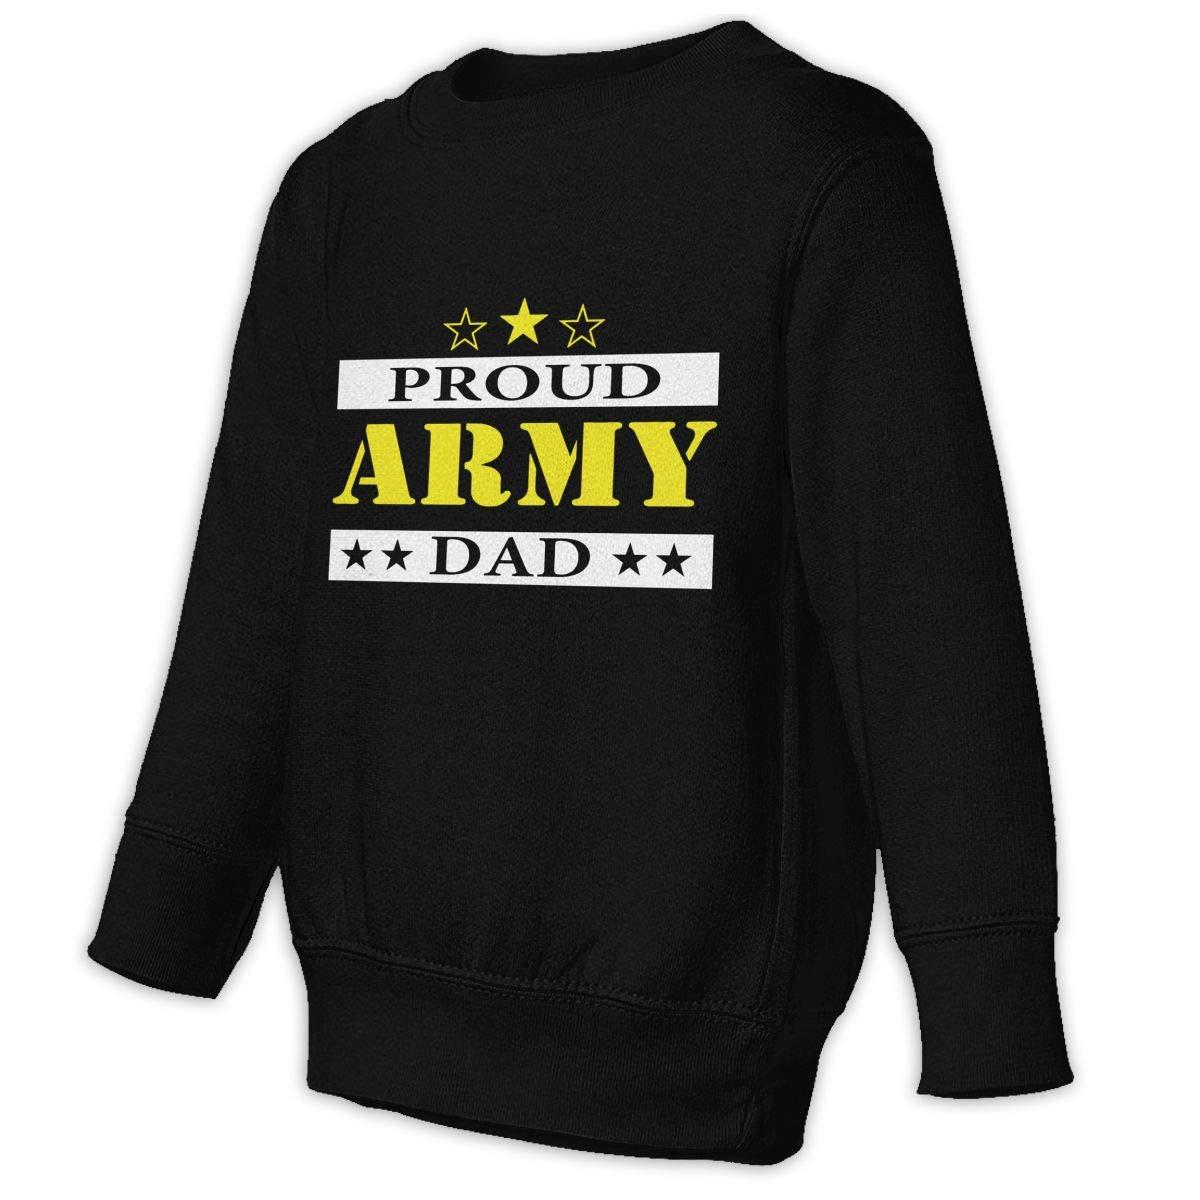 GHYNJUM Army Dad Proud Toddler Unisex Cotton Long Sleeve Round Neck Sweatshirt